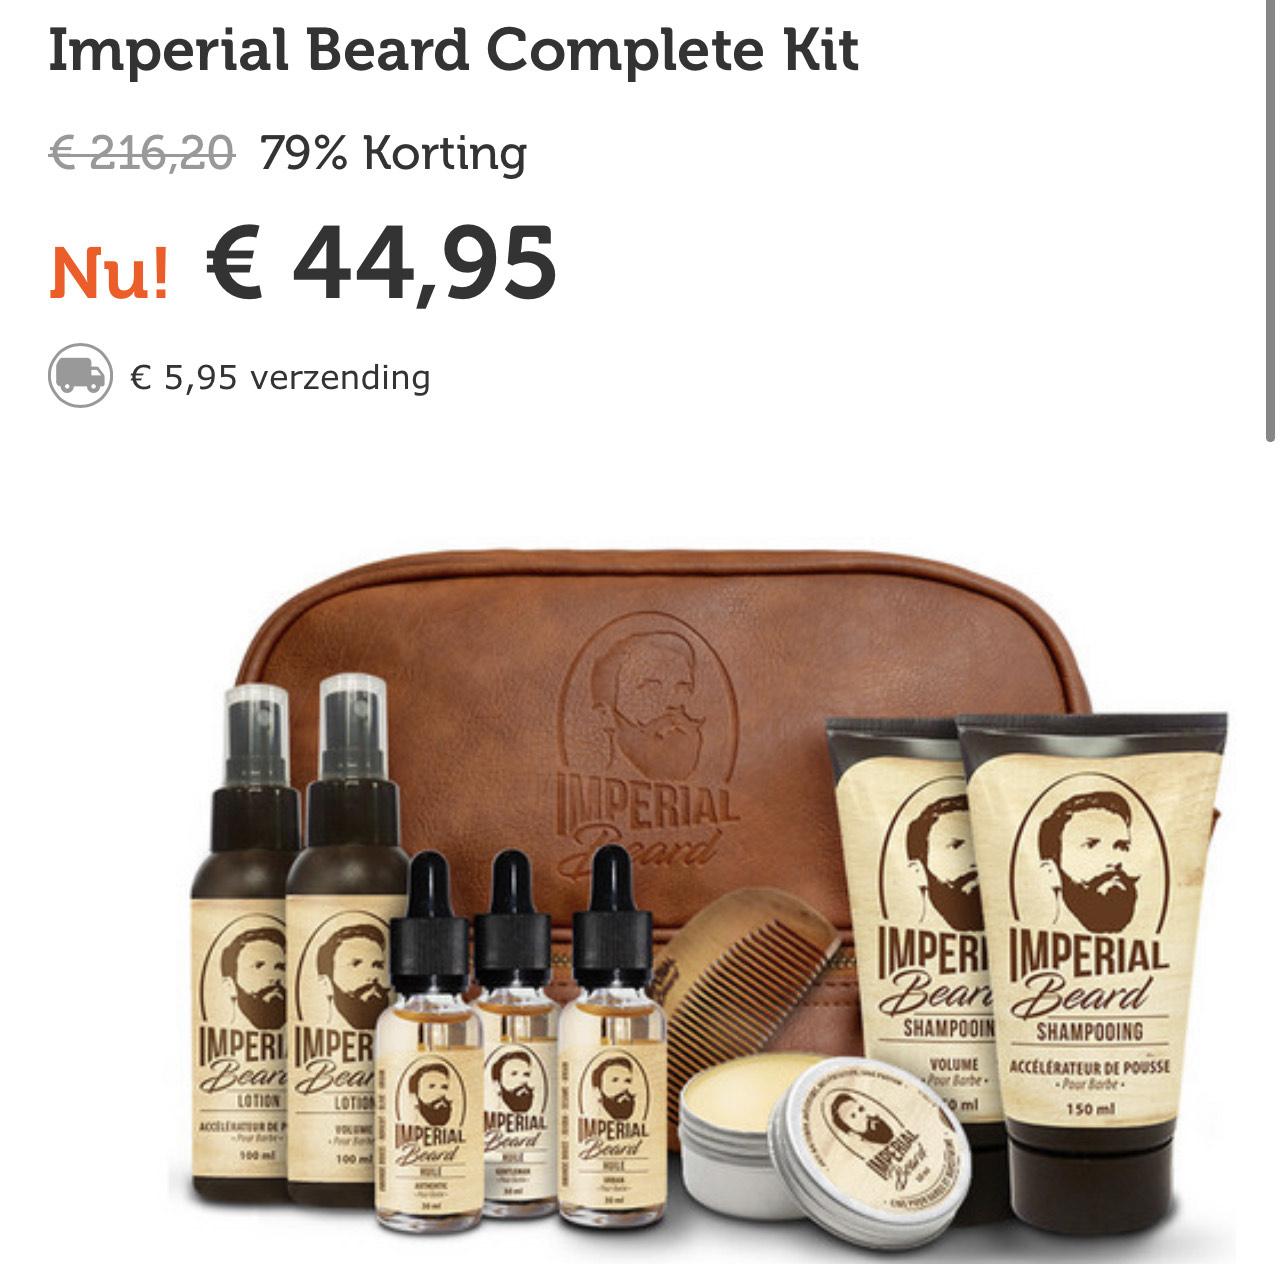 Imperial beard complete Kit @ iBOOD